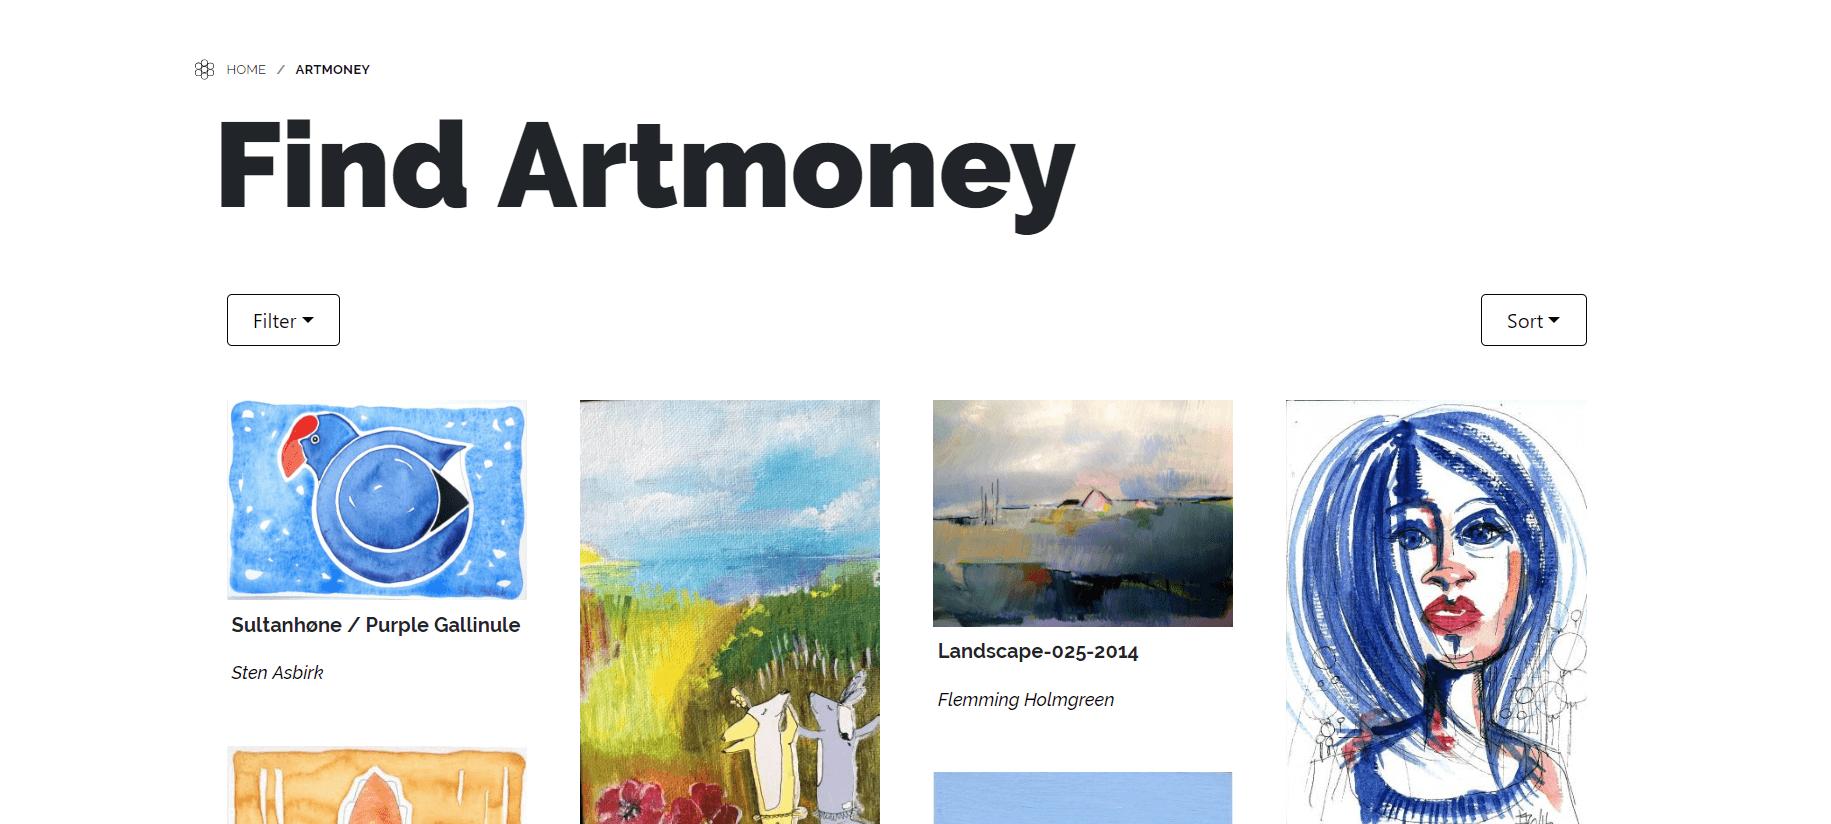 karoline, paarup, portfolio, website, project, artmoney, cover